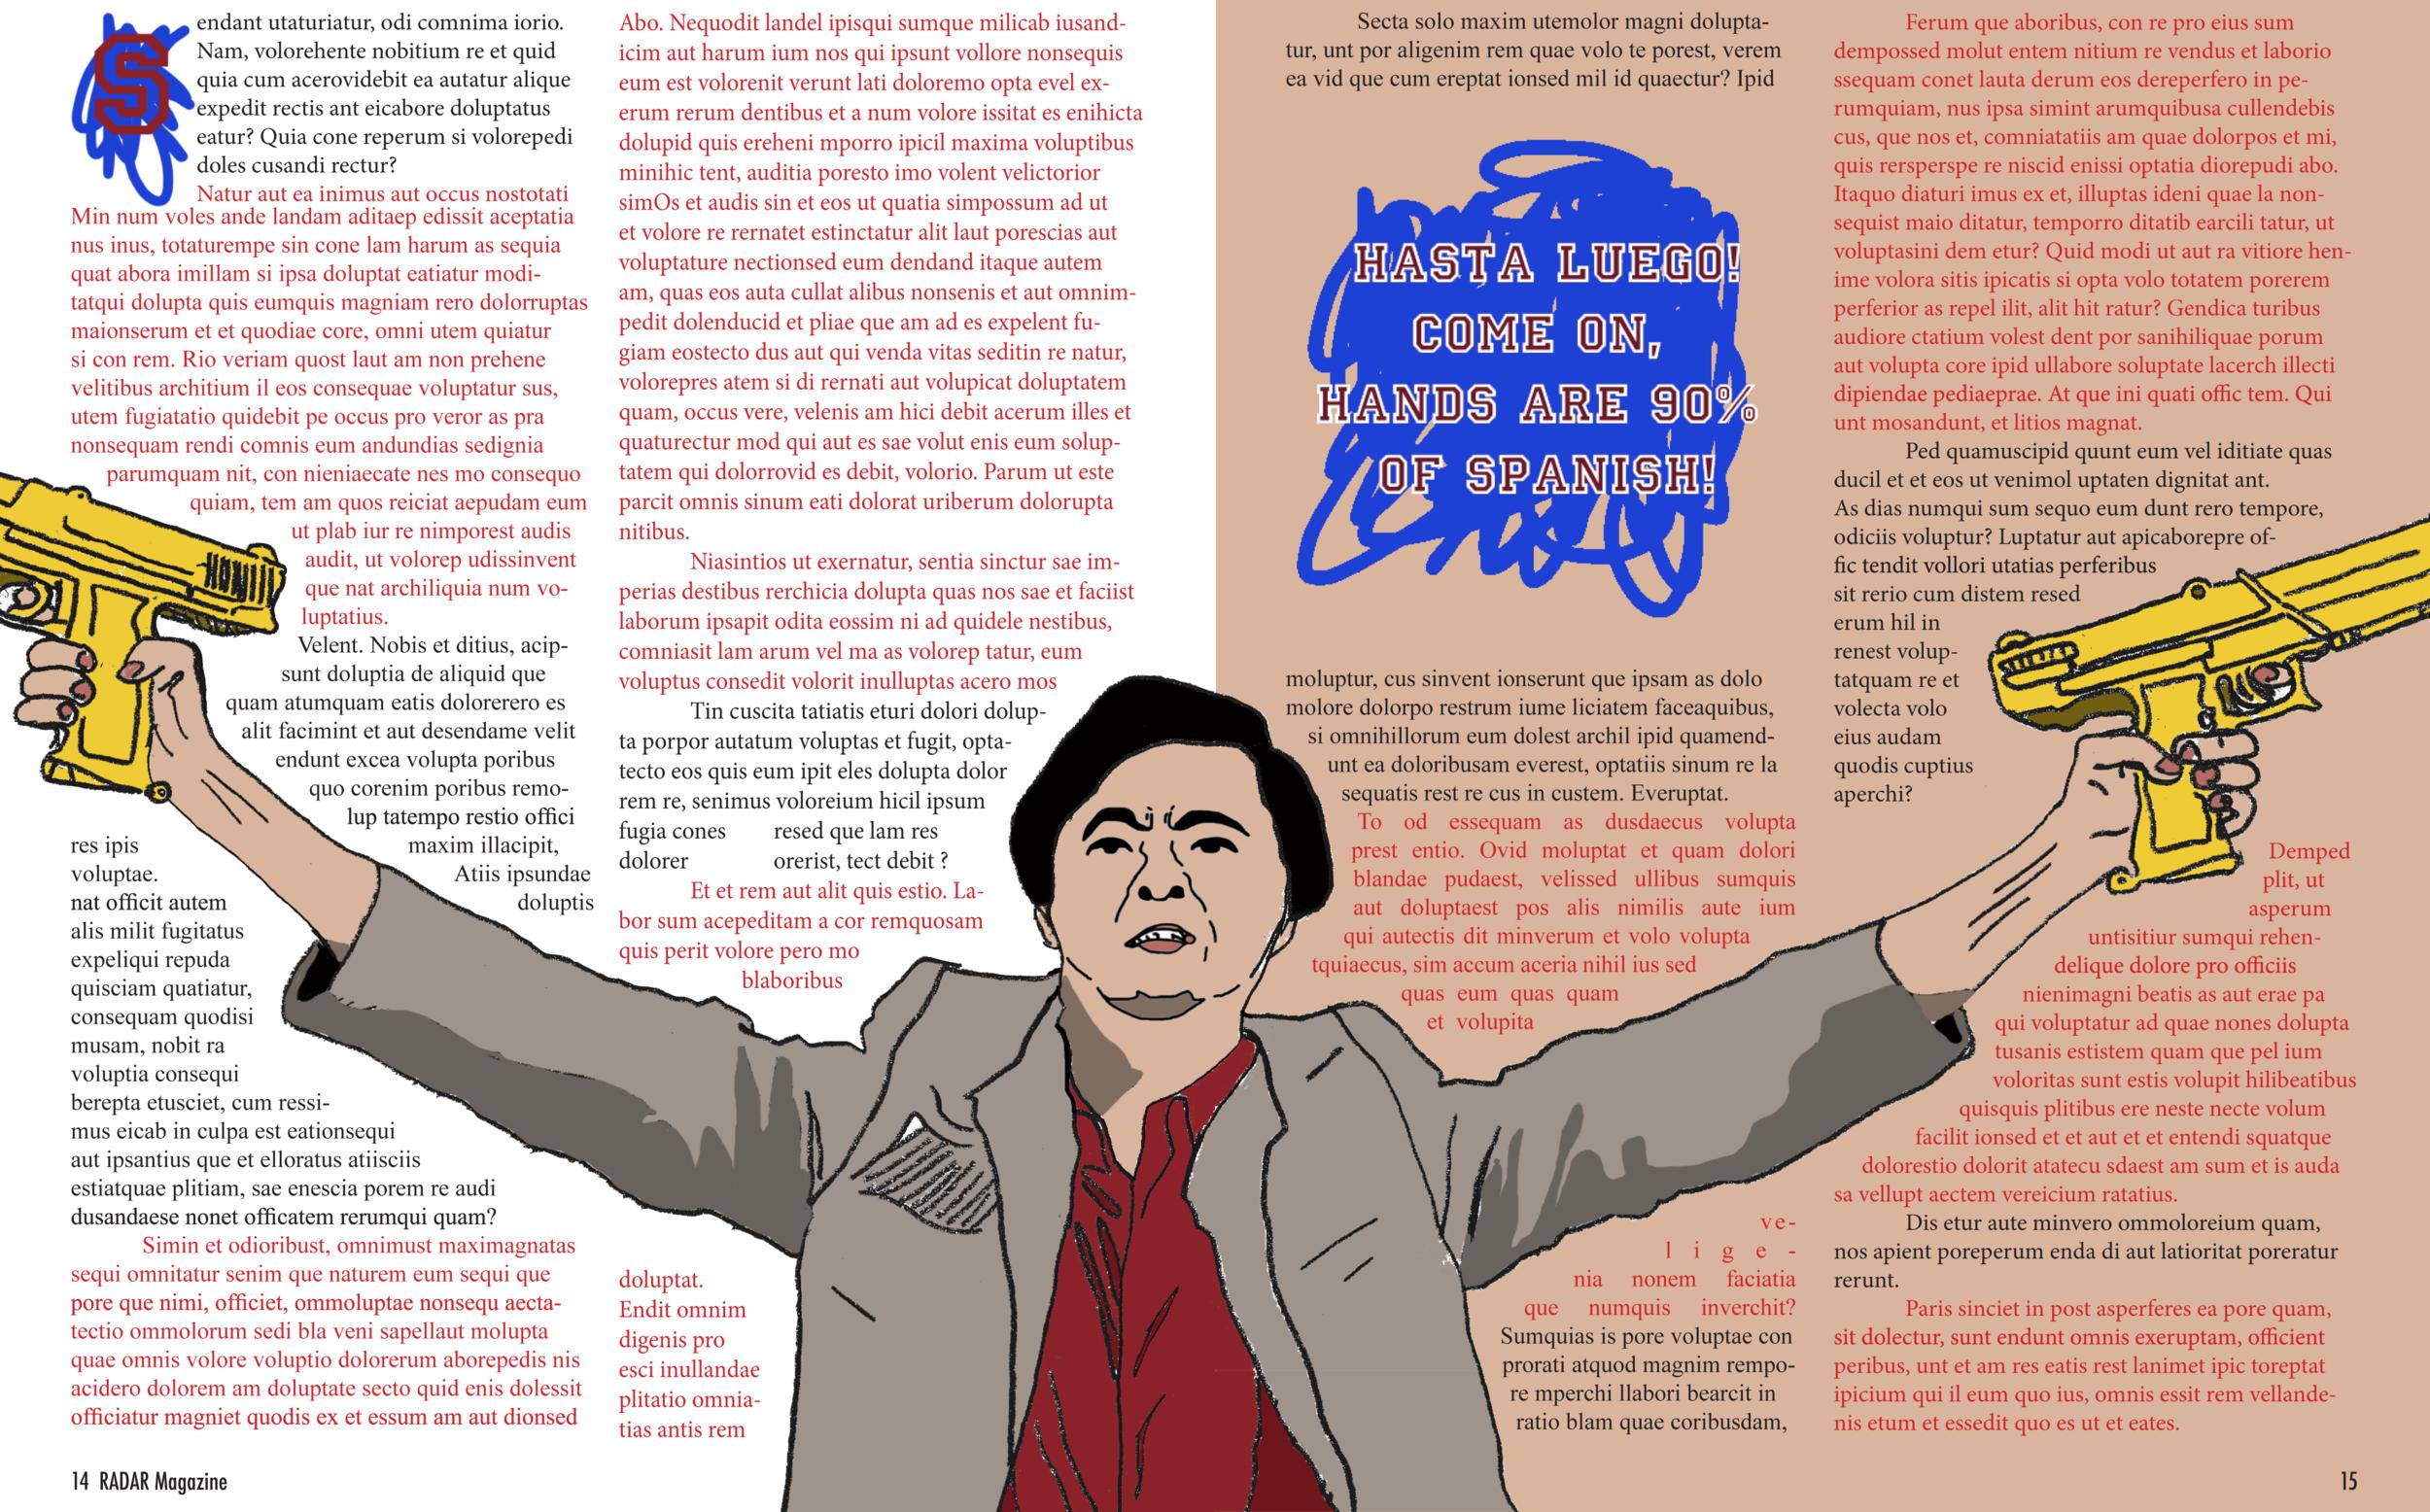 chang magazine part 2.png